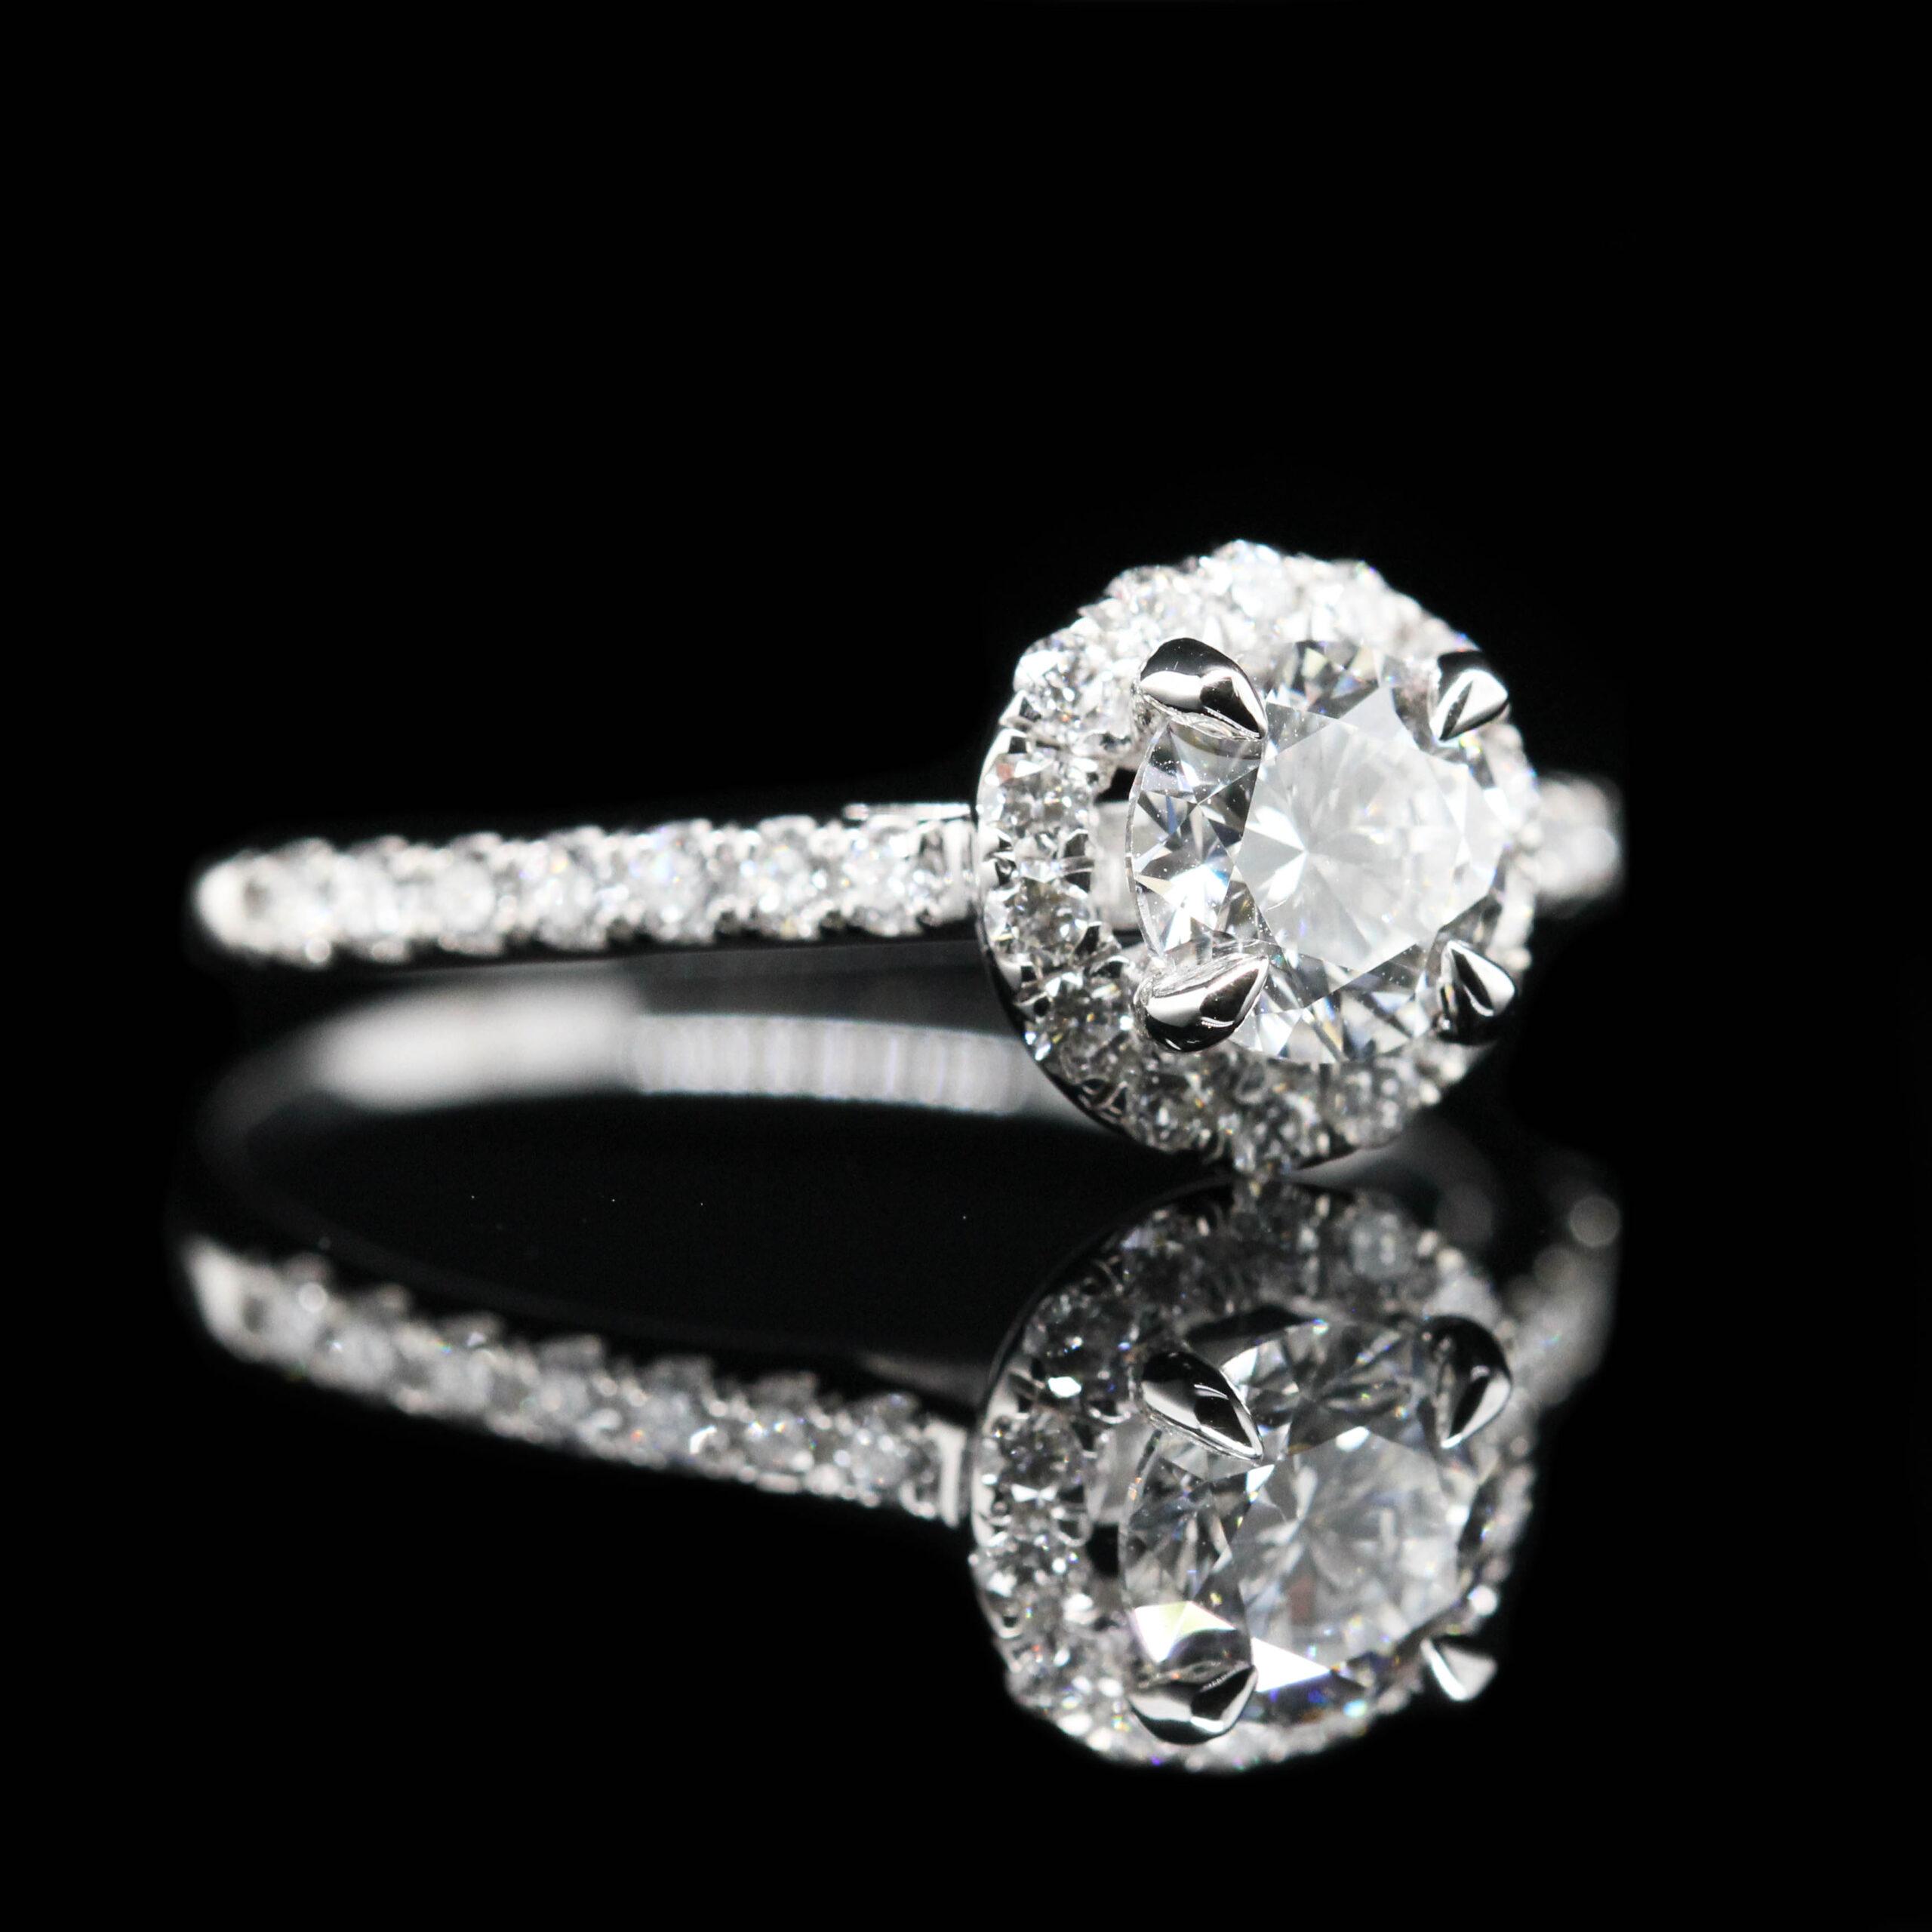 clayfield jewellery sustainable diamond rings brisbane